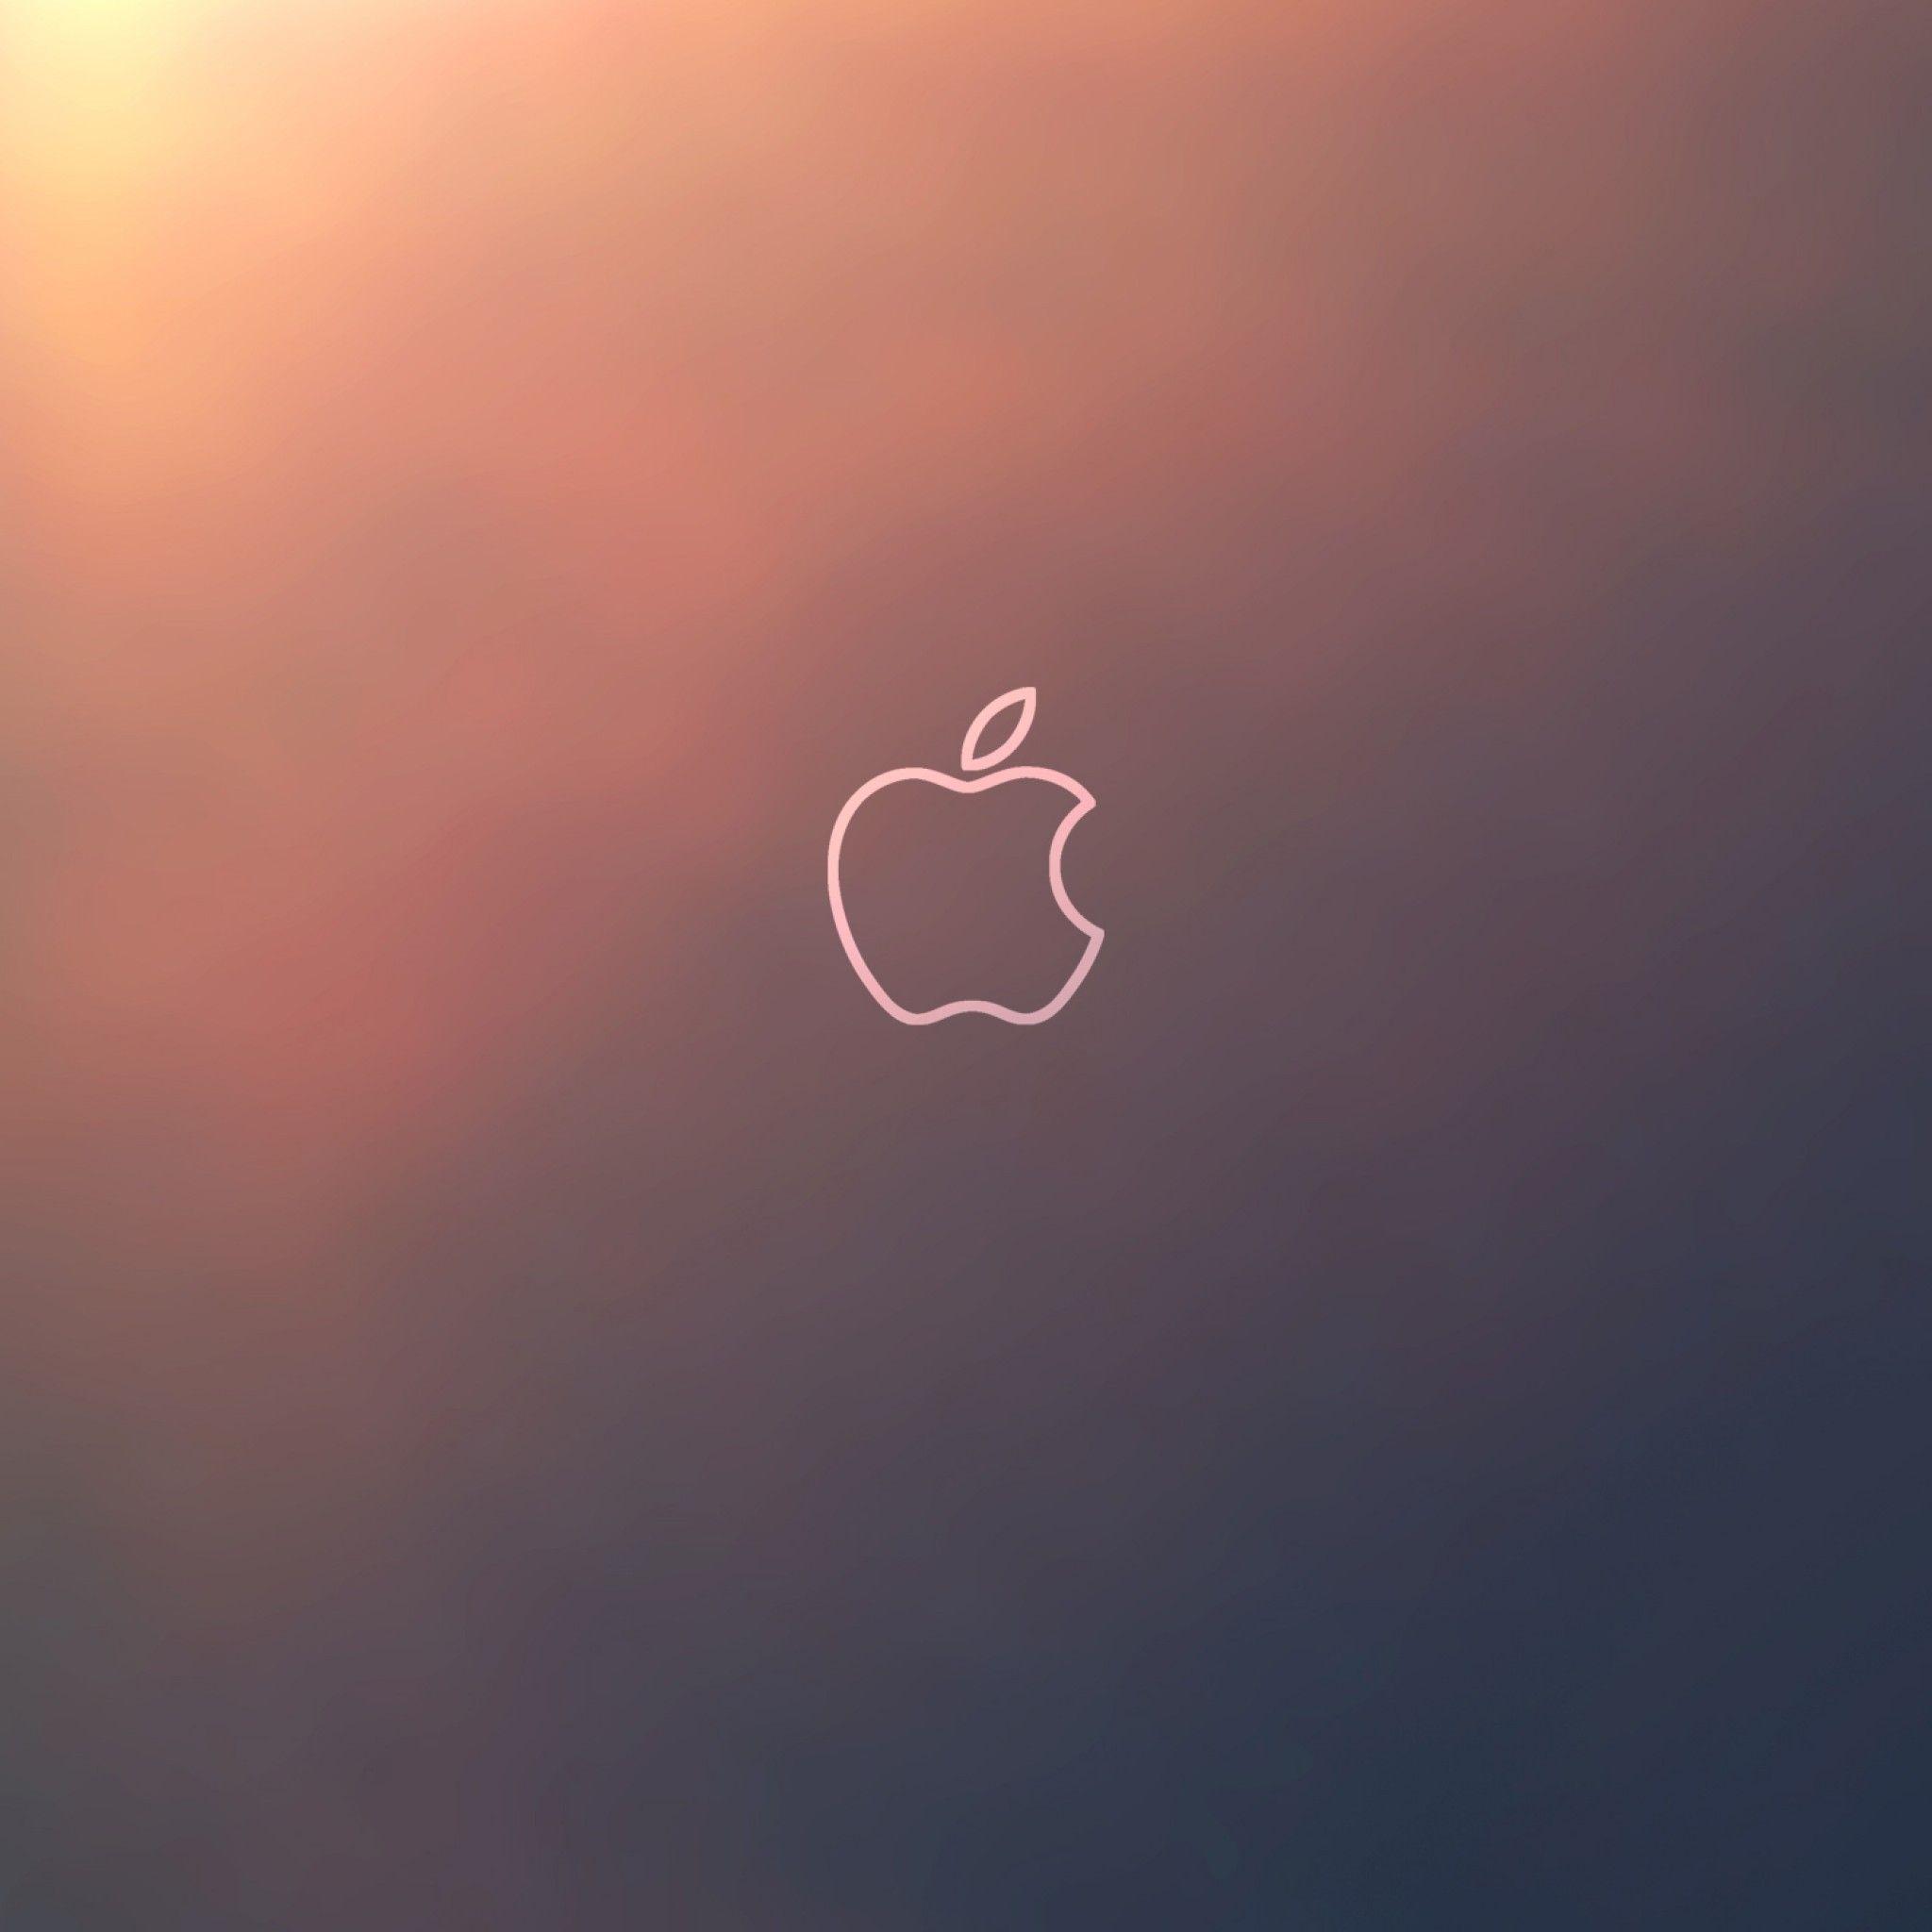 Apple Logoの壁紙 Ipad Mini Wallpaper Ipad Air Wallpaper Apple